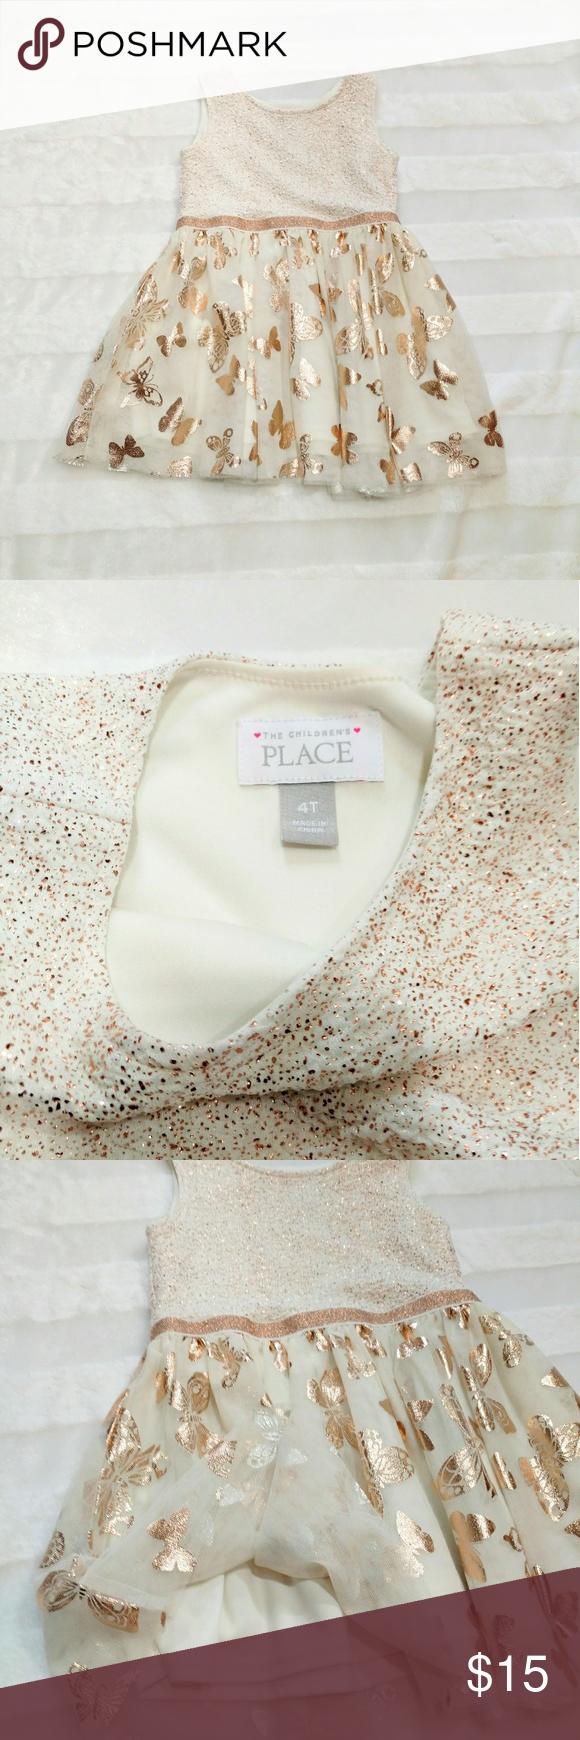 3 20 Children S Place Dress White Butterfly 4t Place Dress Fashion White Dress [ 1740 x 580 Pixel ]